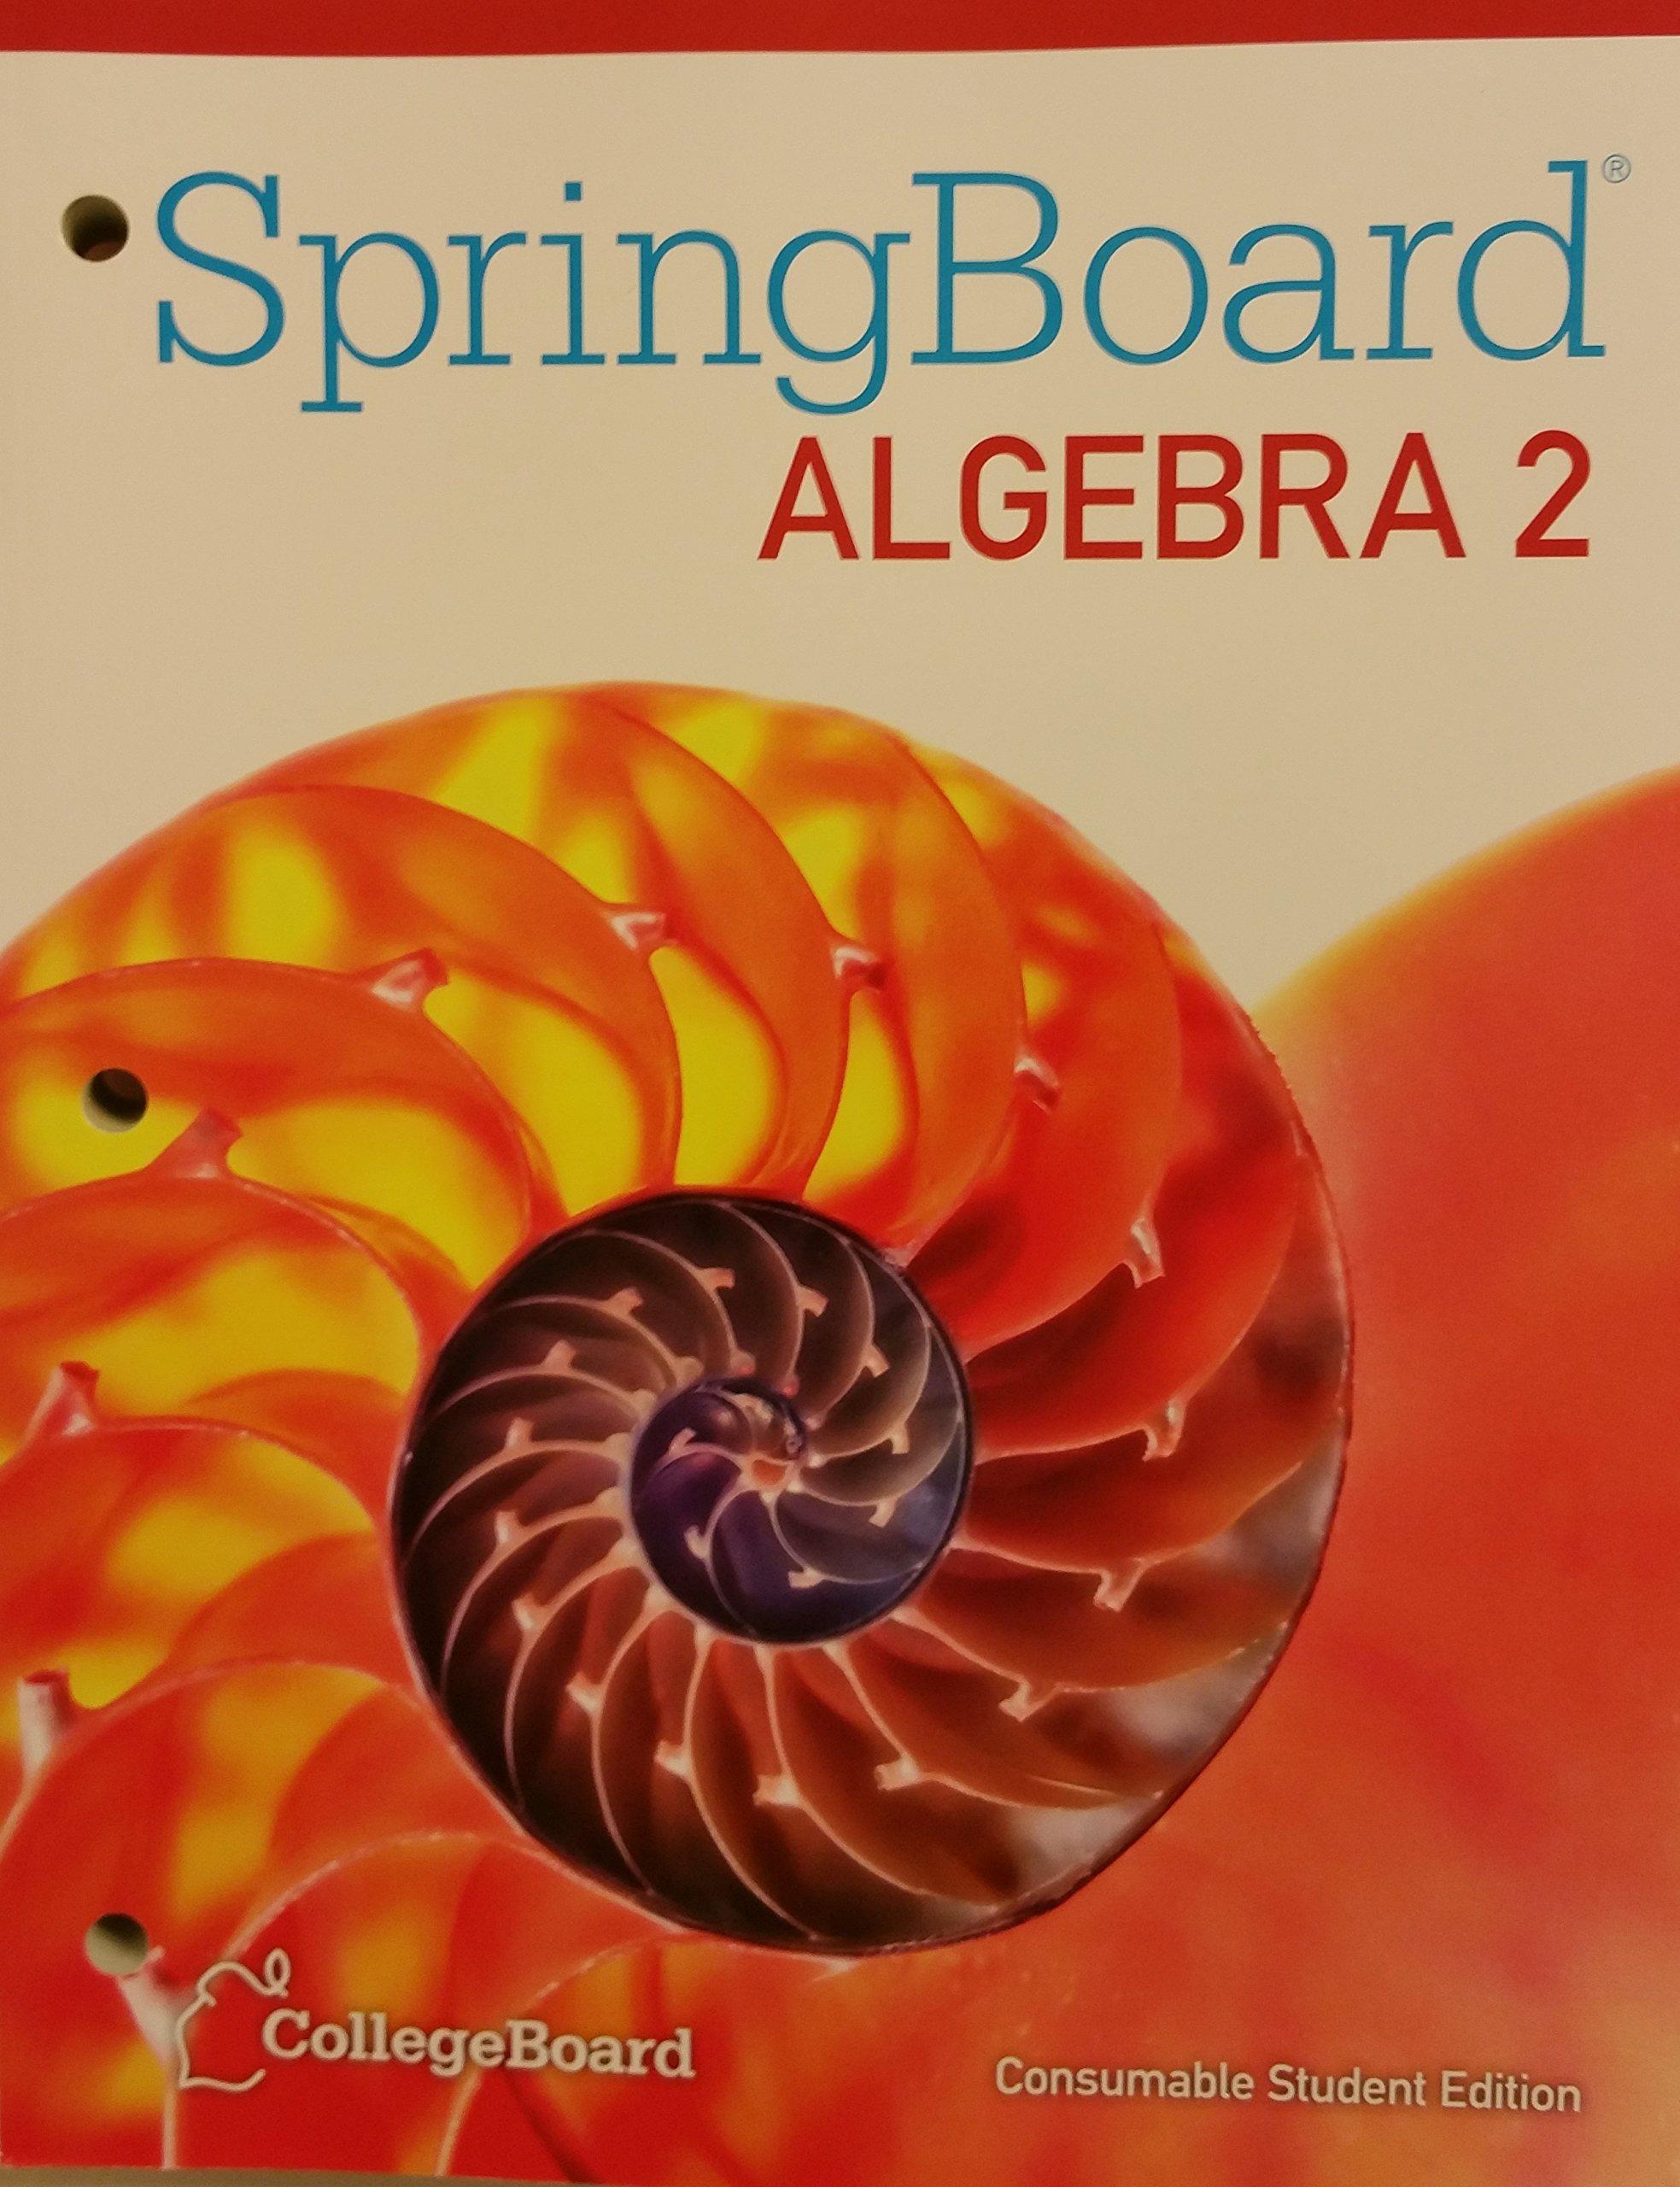 SpringBoard Algebra 2 Consumable Student Edition 2015